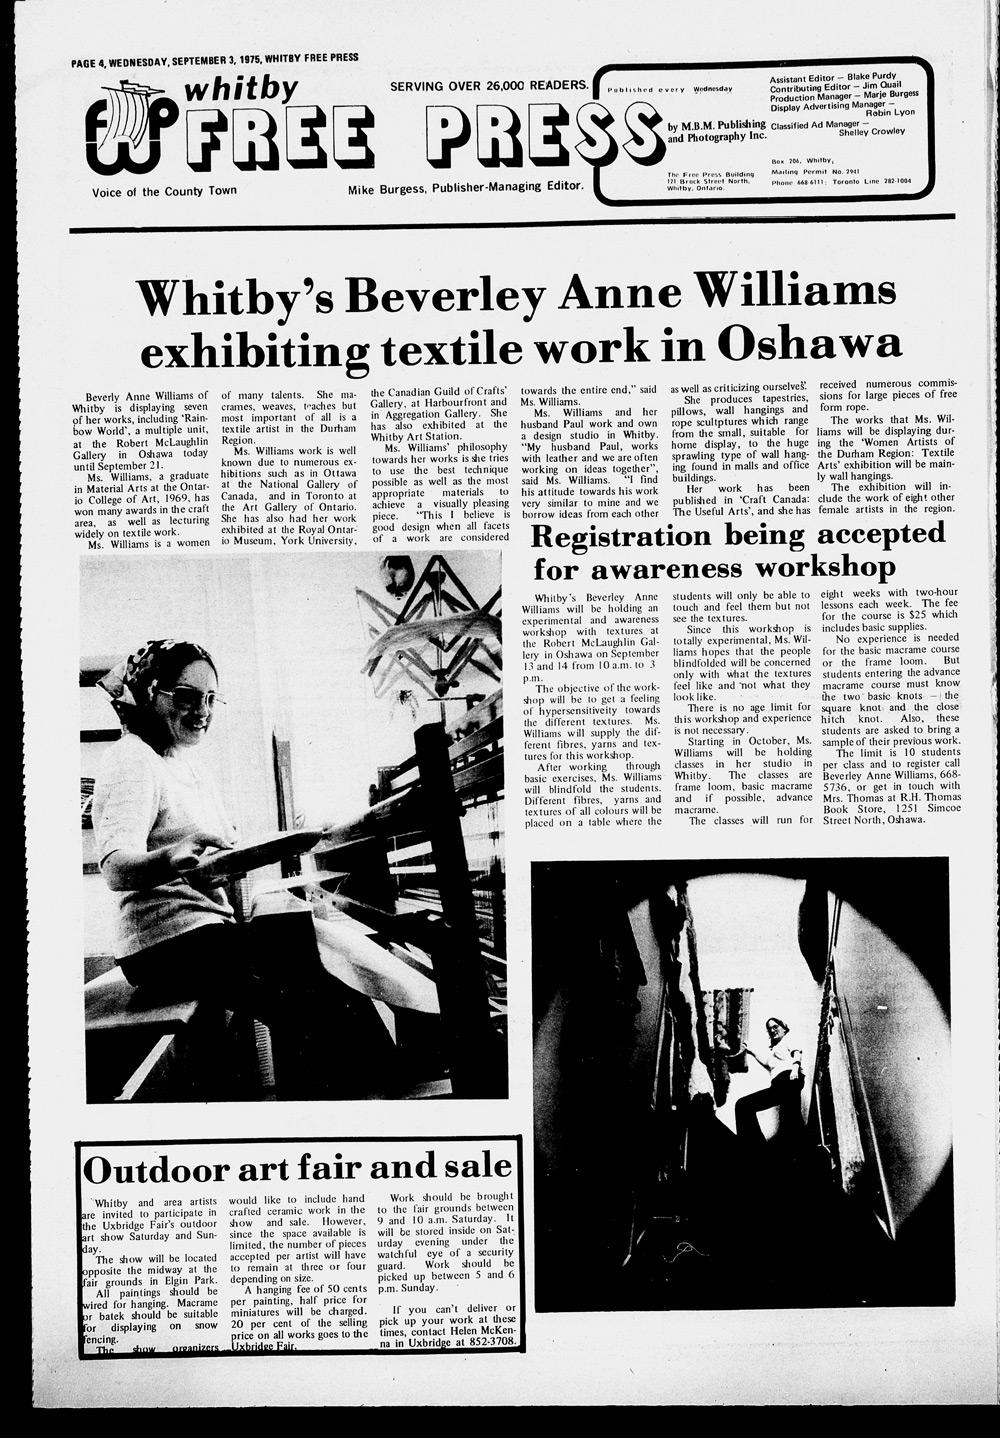 Whitby Free Press, 3 Sep 1975